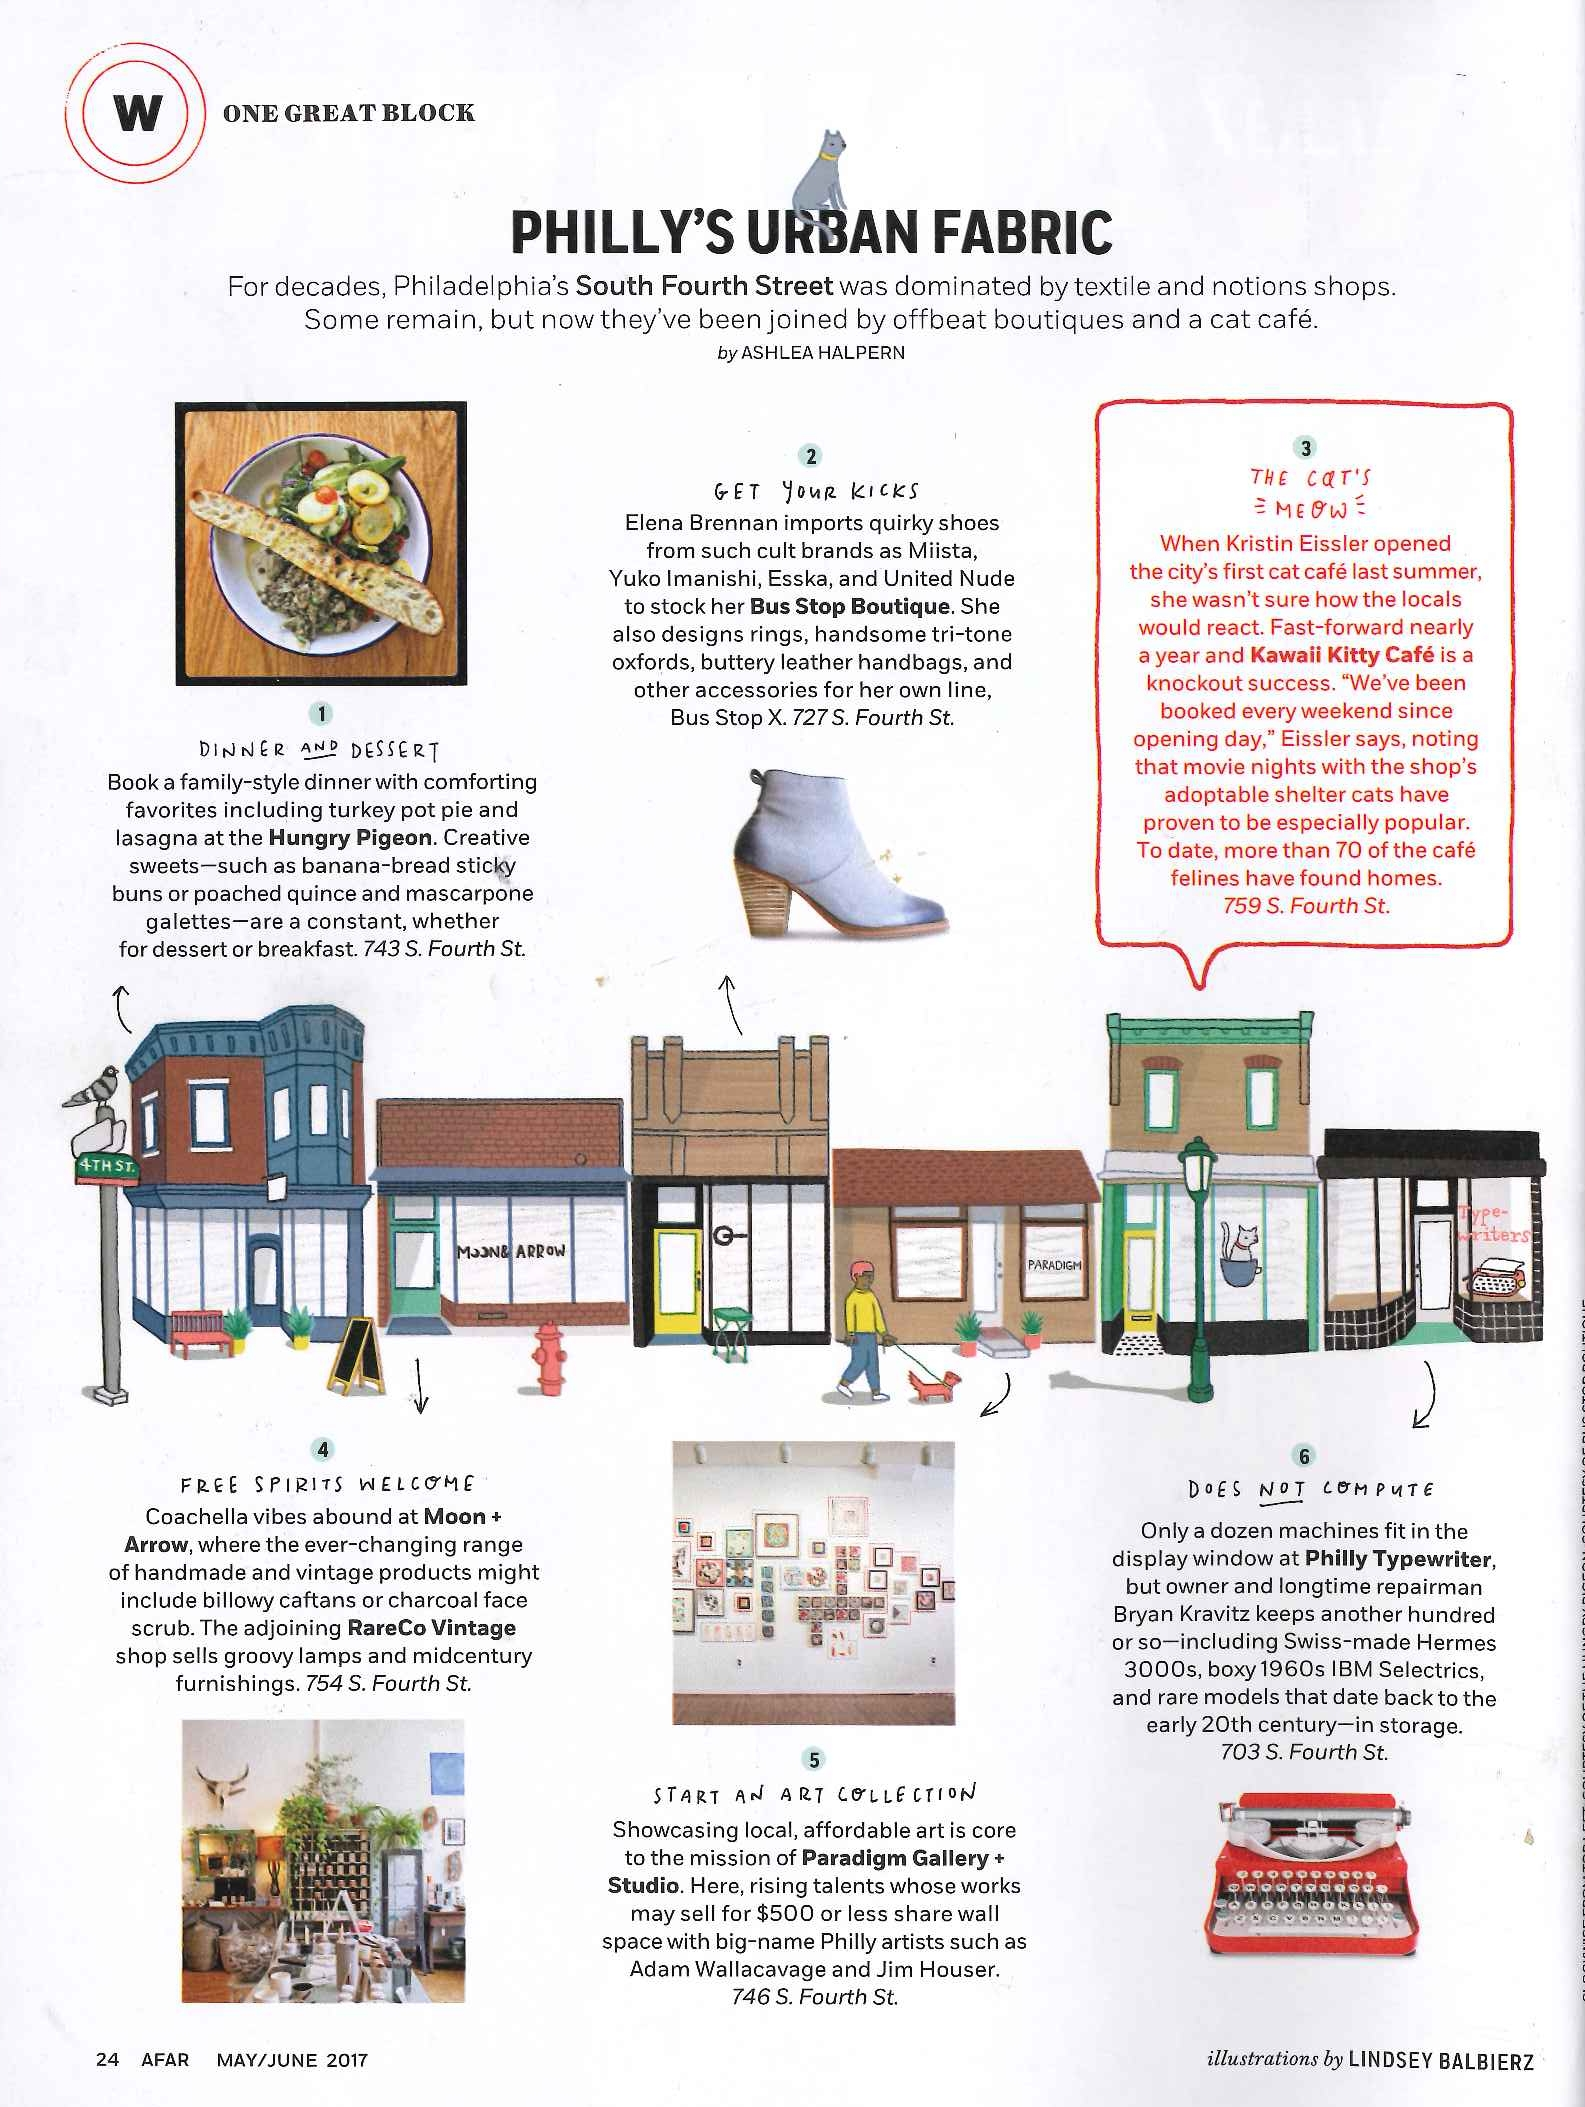 Afar_Magazine_Fabric_Row_Philadelphia_Best_Restaurants_Visit_Philadelphia